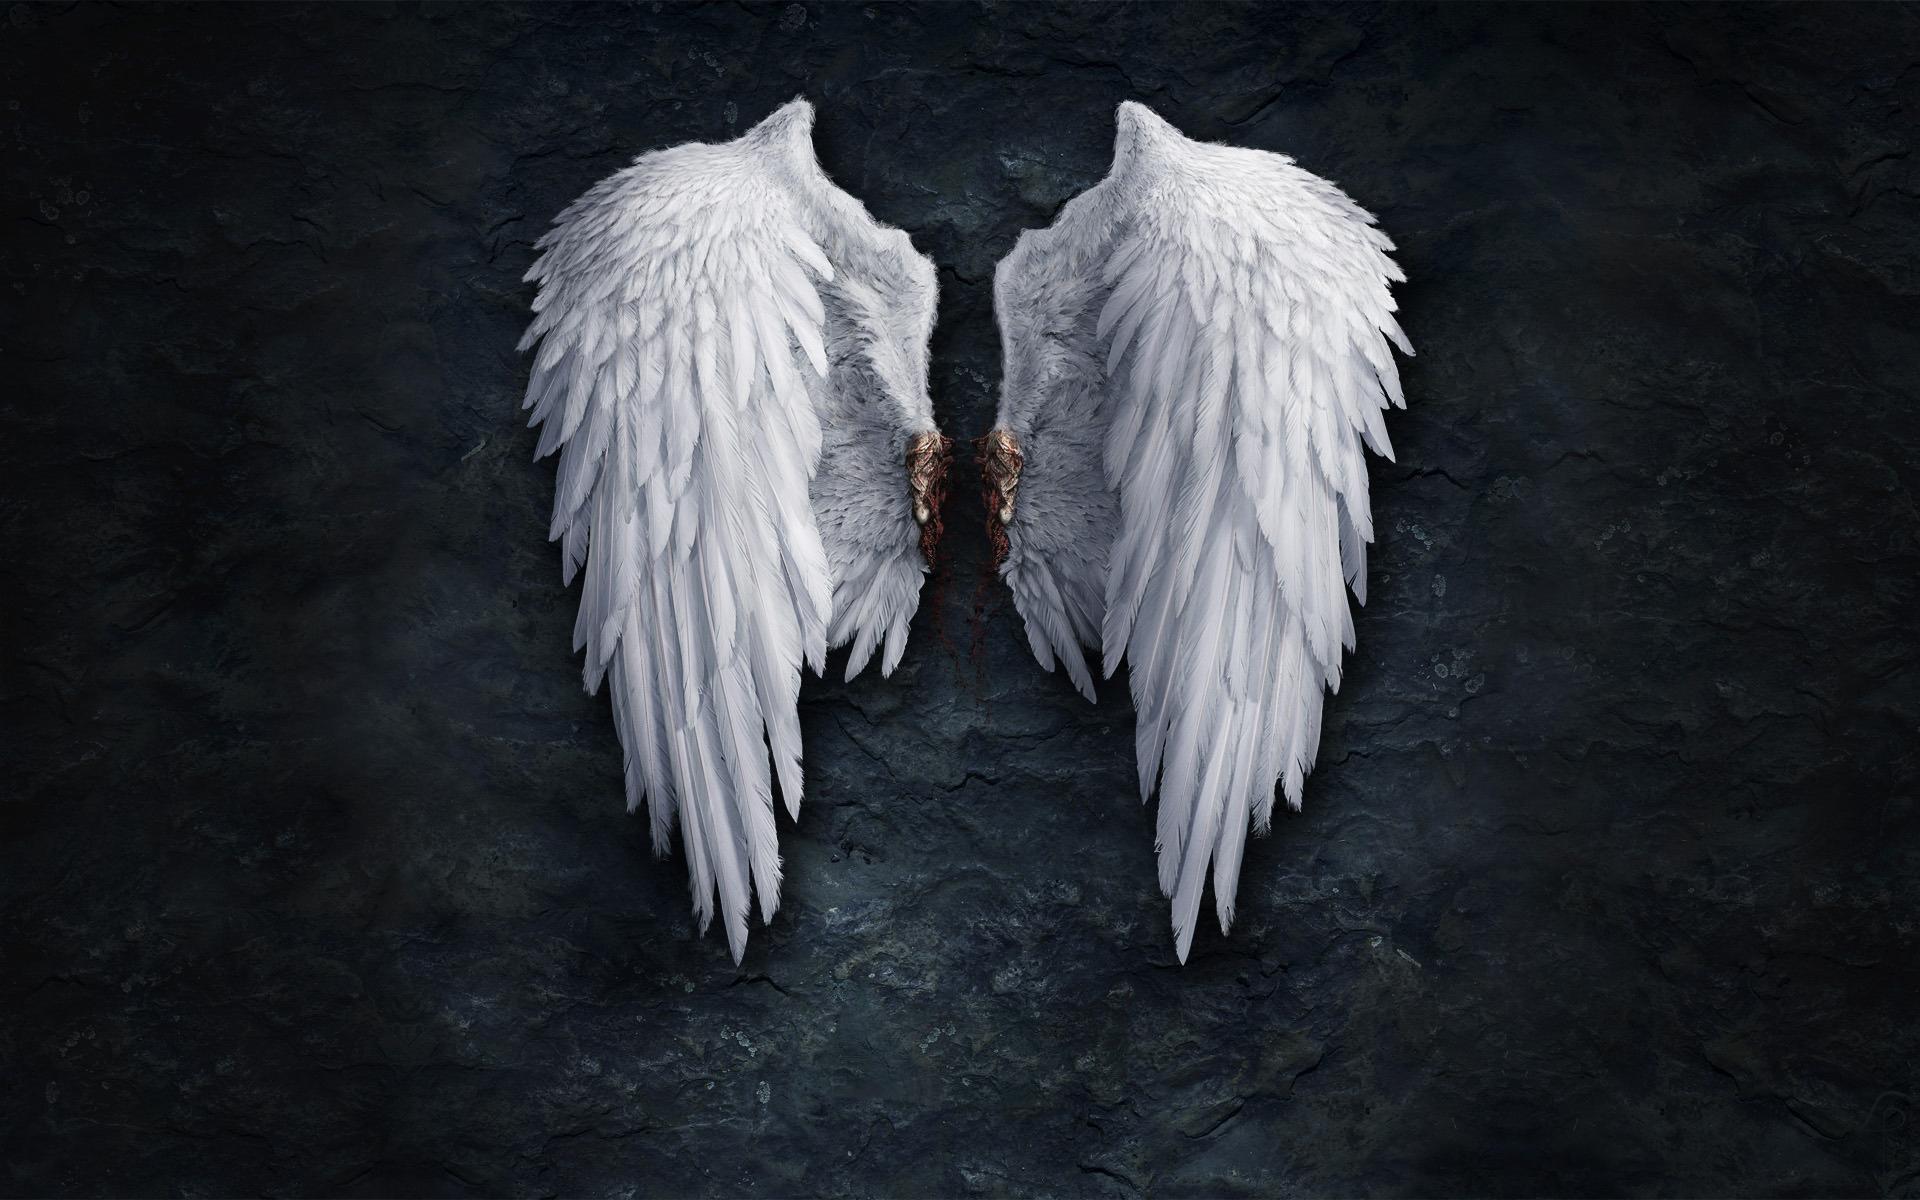 47] Angel Wing Wallpaper on WallpaperSafari 1920x1200